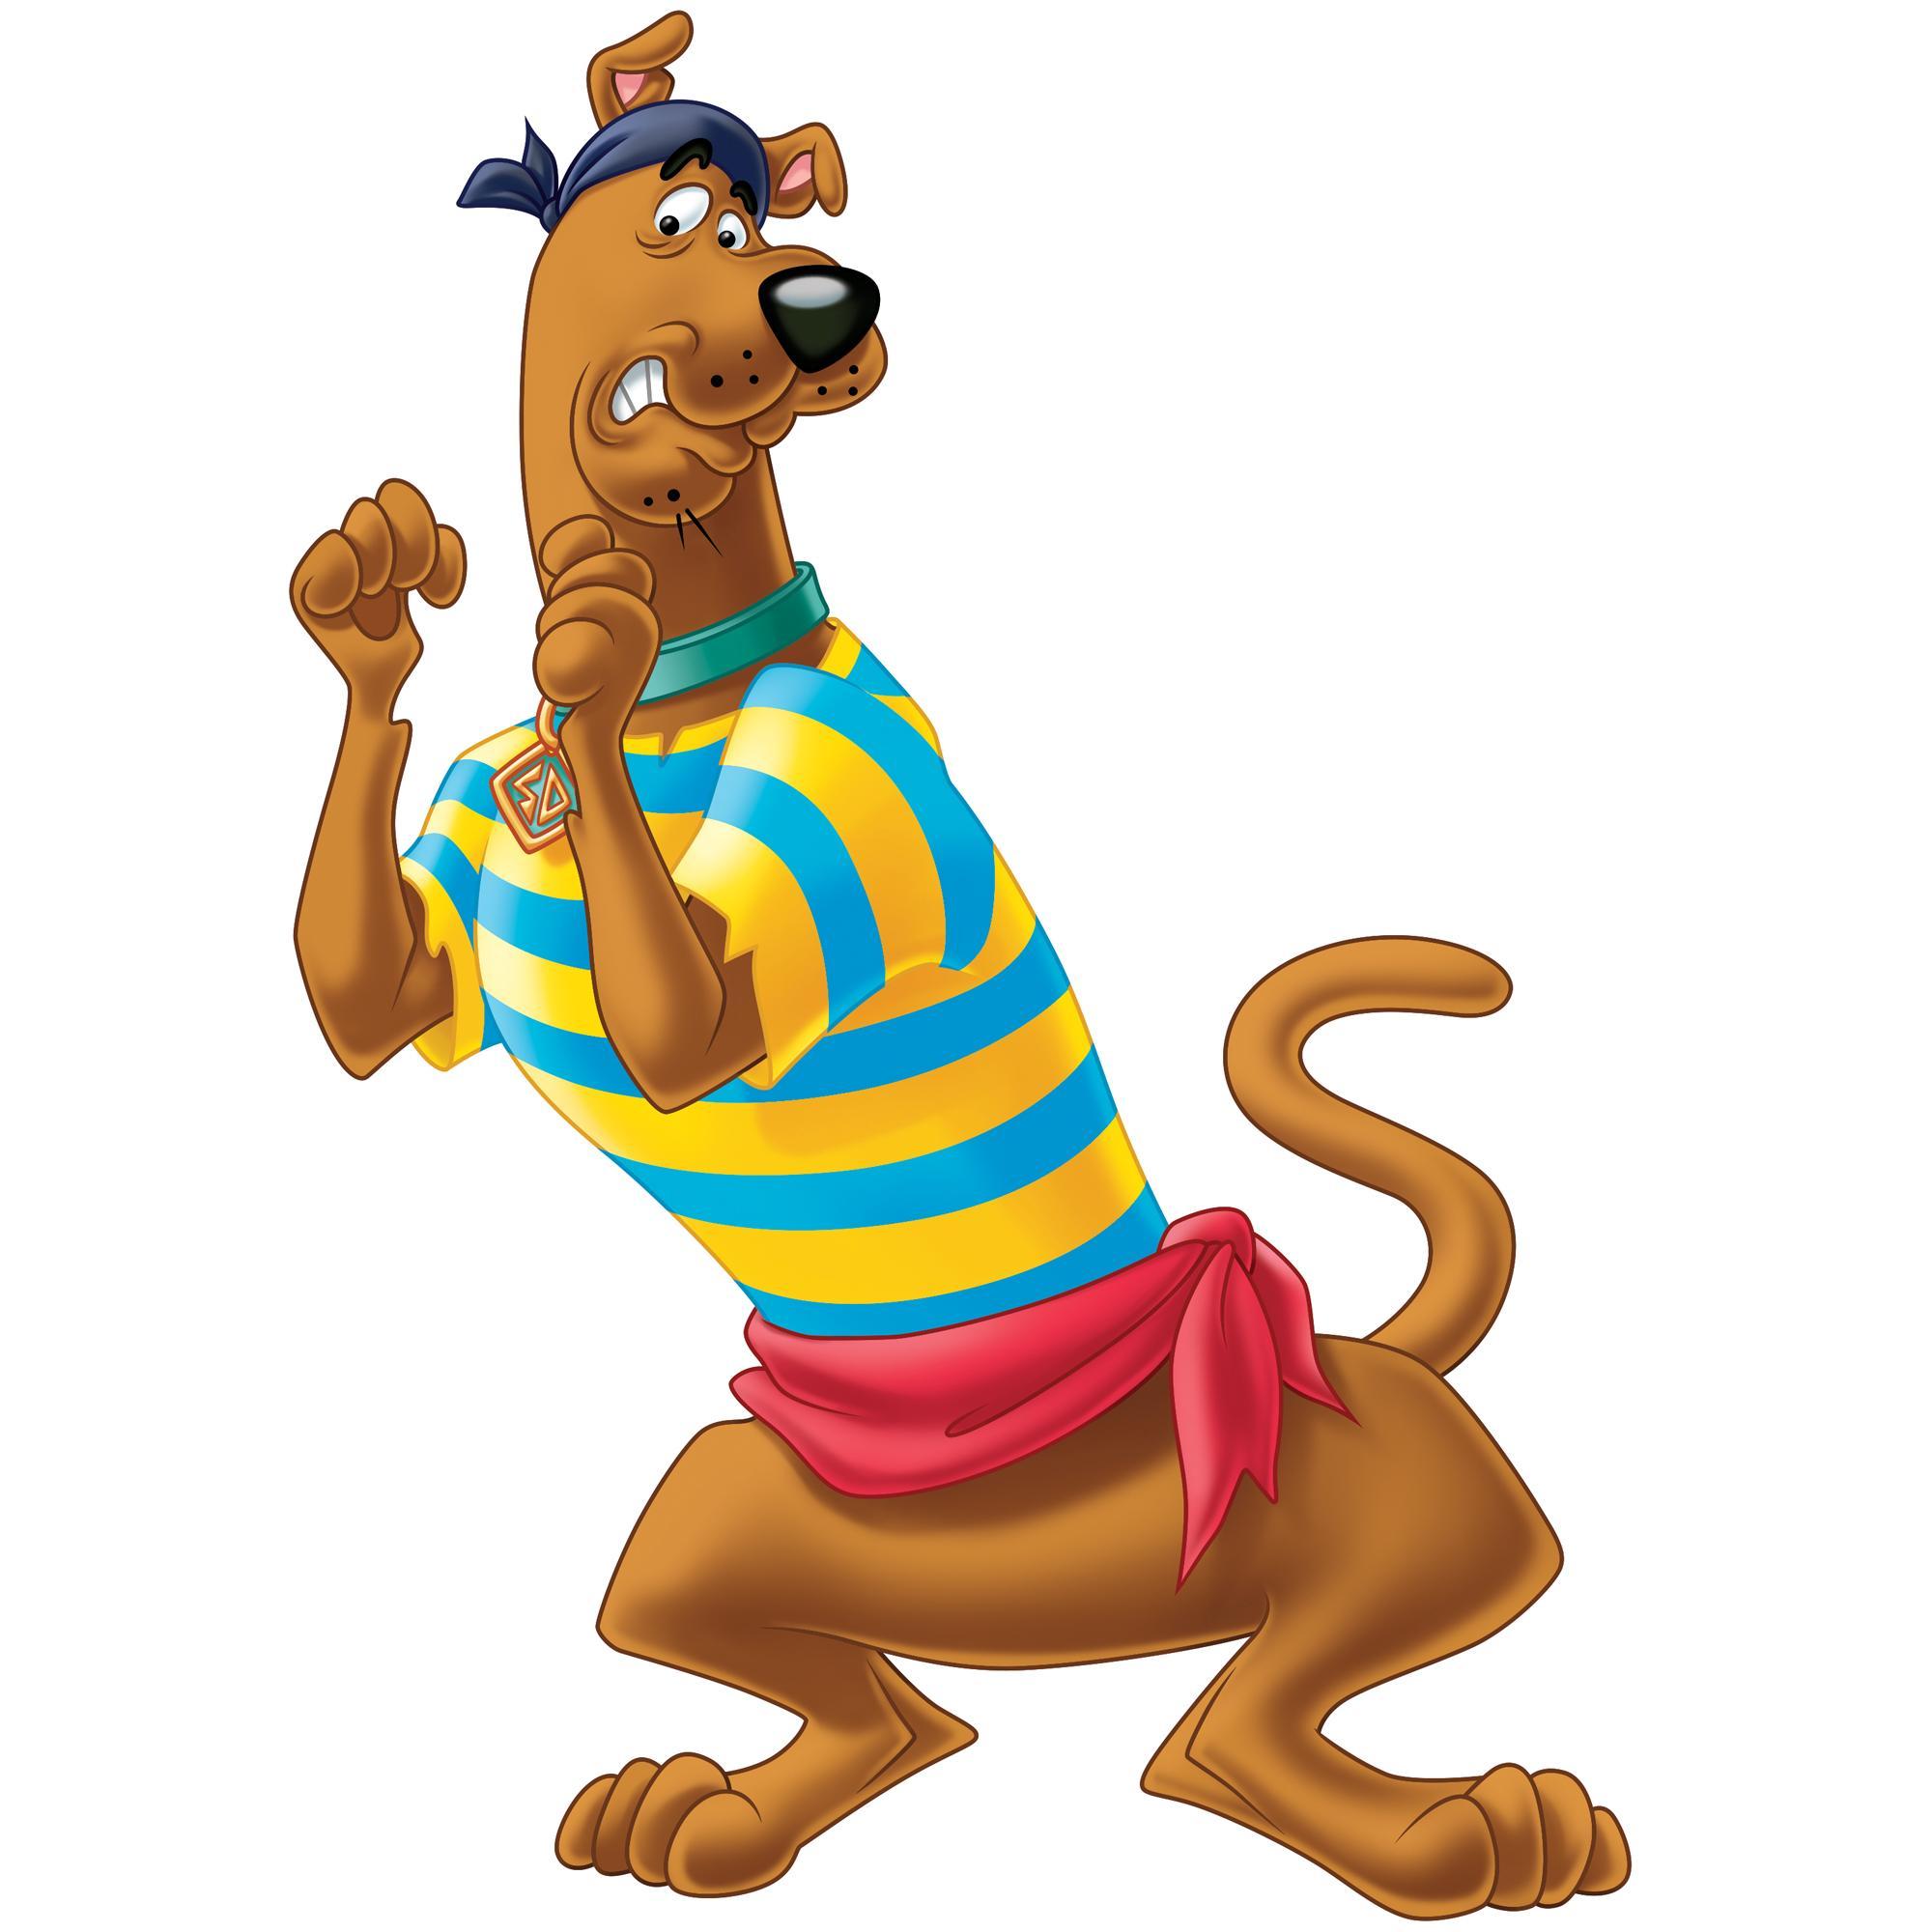 Scooby doo pirate fort and action figure 7 - De scooby doo ...